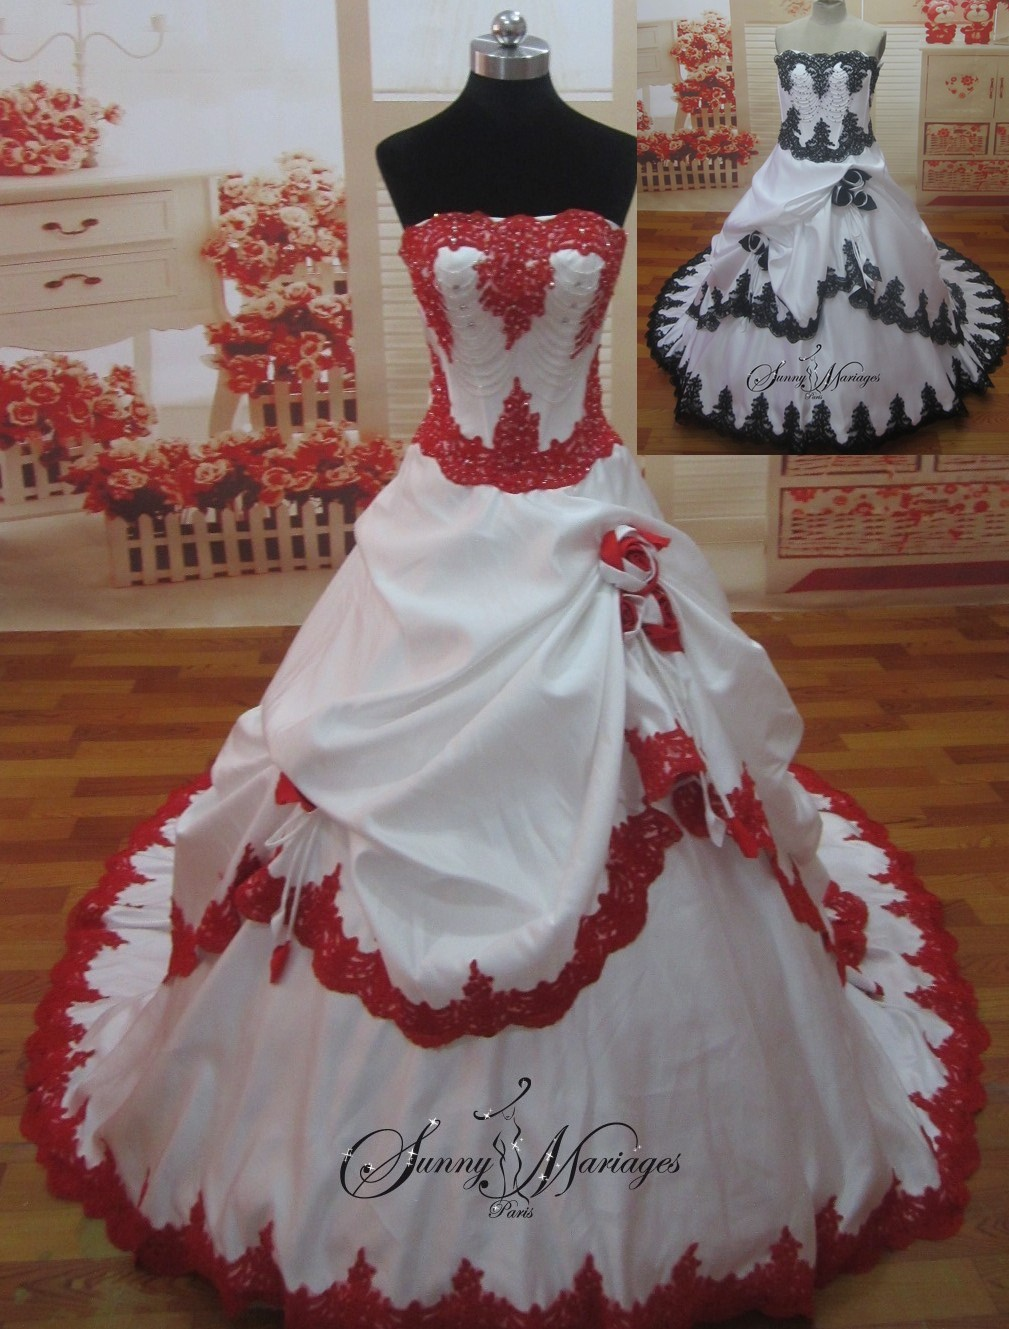 robe de mariee rouge et blanche robe de mariee dentelle rouge robe de mariee satin et dentelle. Black Bedroom Furniture Sets. Home Design Ideas